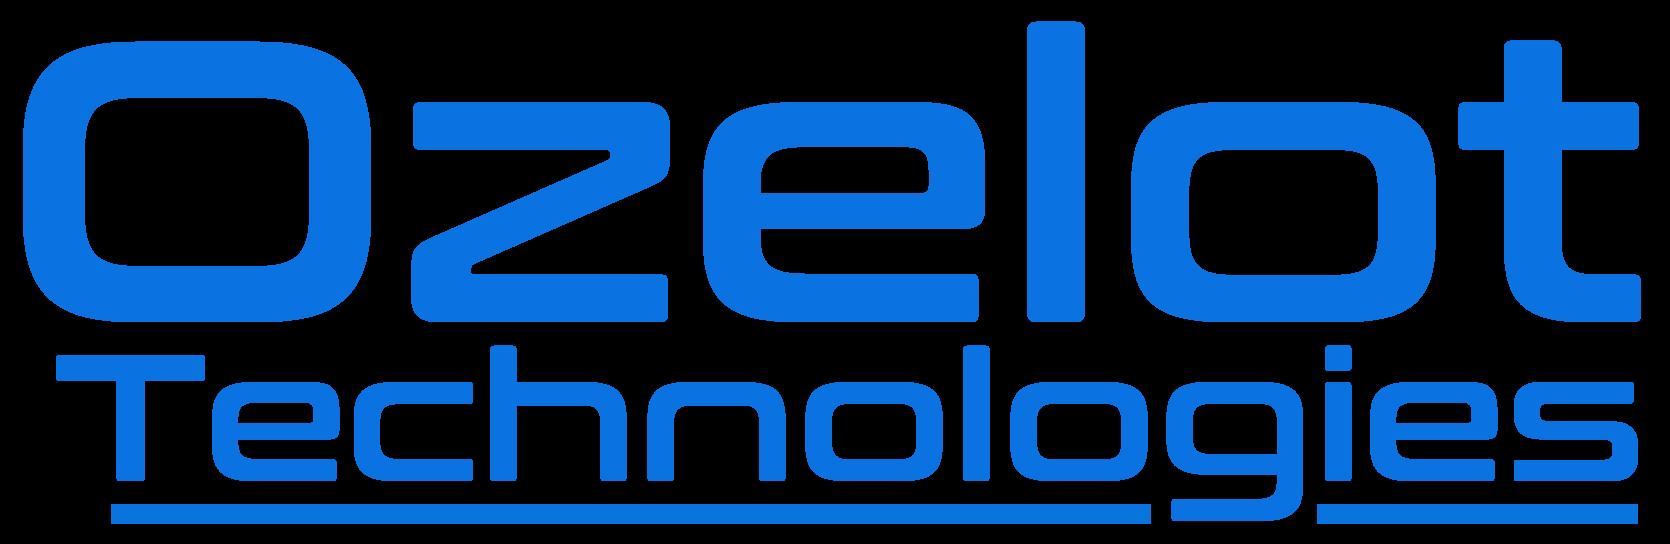 Ozelot Technologies